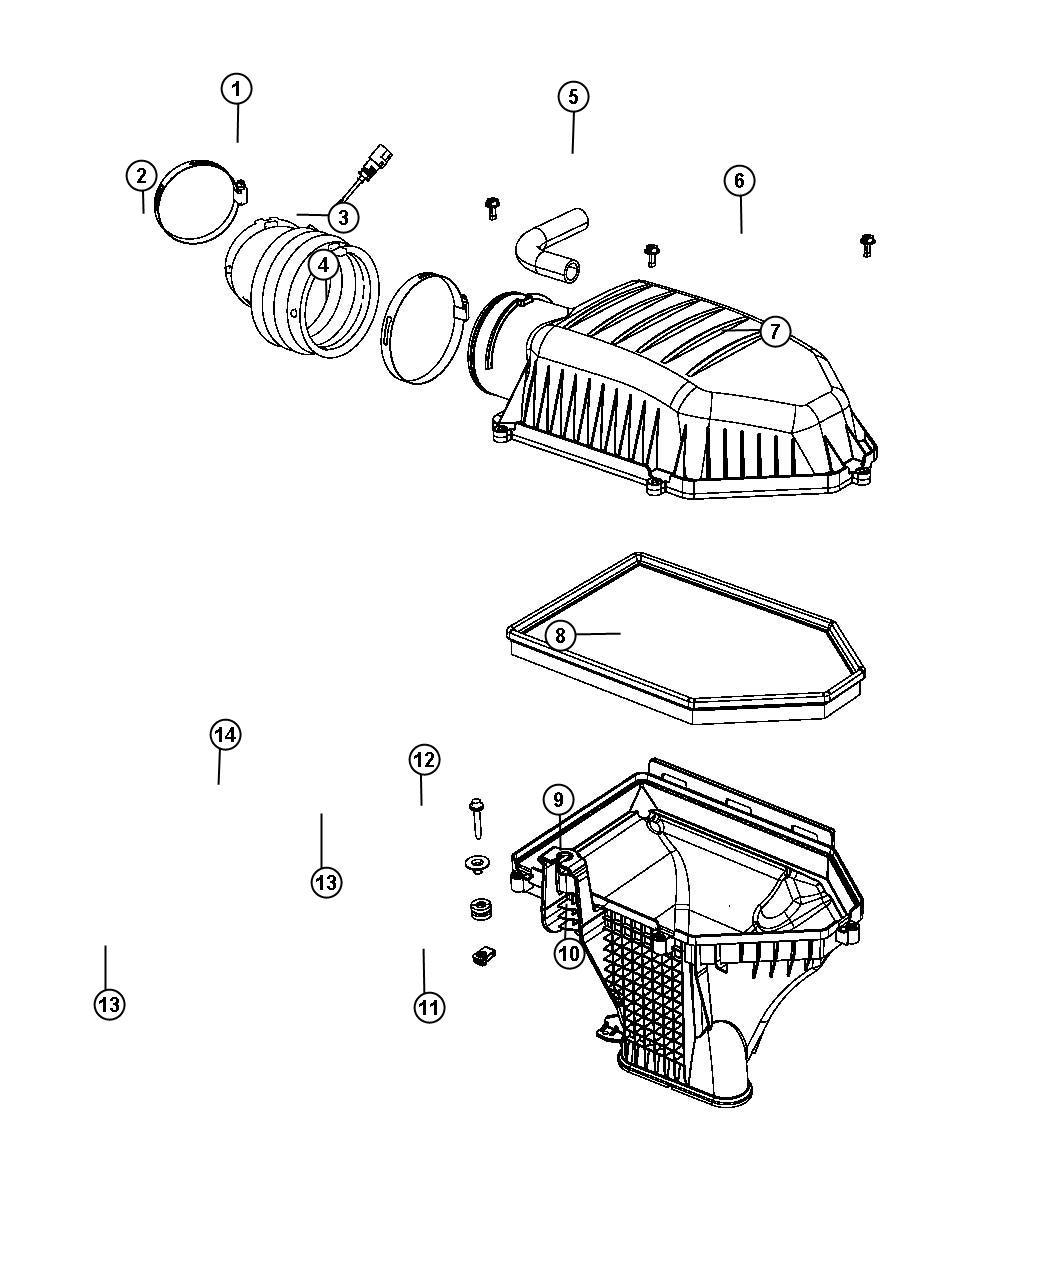 Dodge Charger Sensor. Charge air temp. Sensors, engine